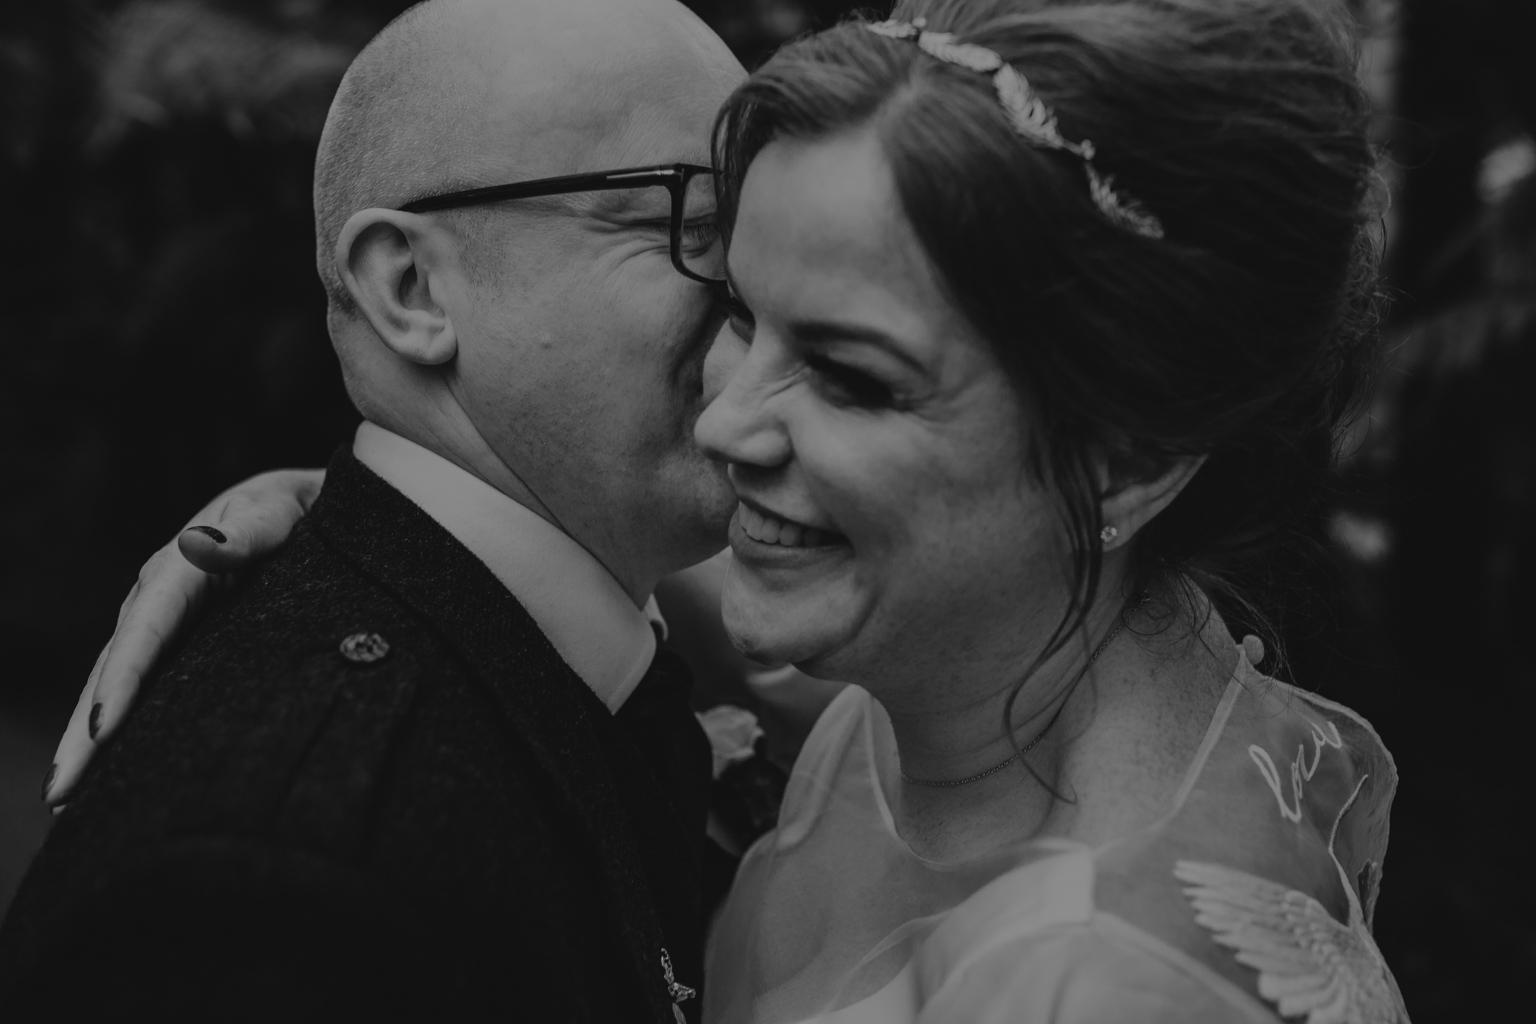 Intimate wedding portrait by Lisa Jane Photography